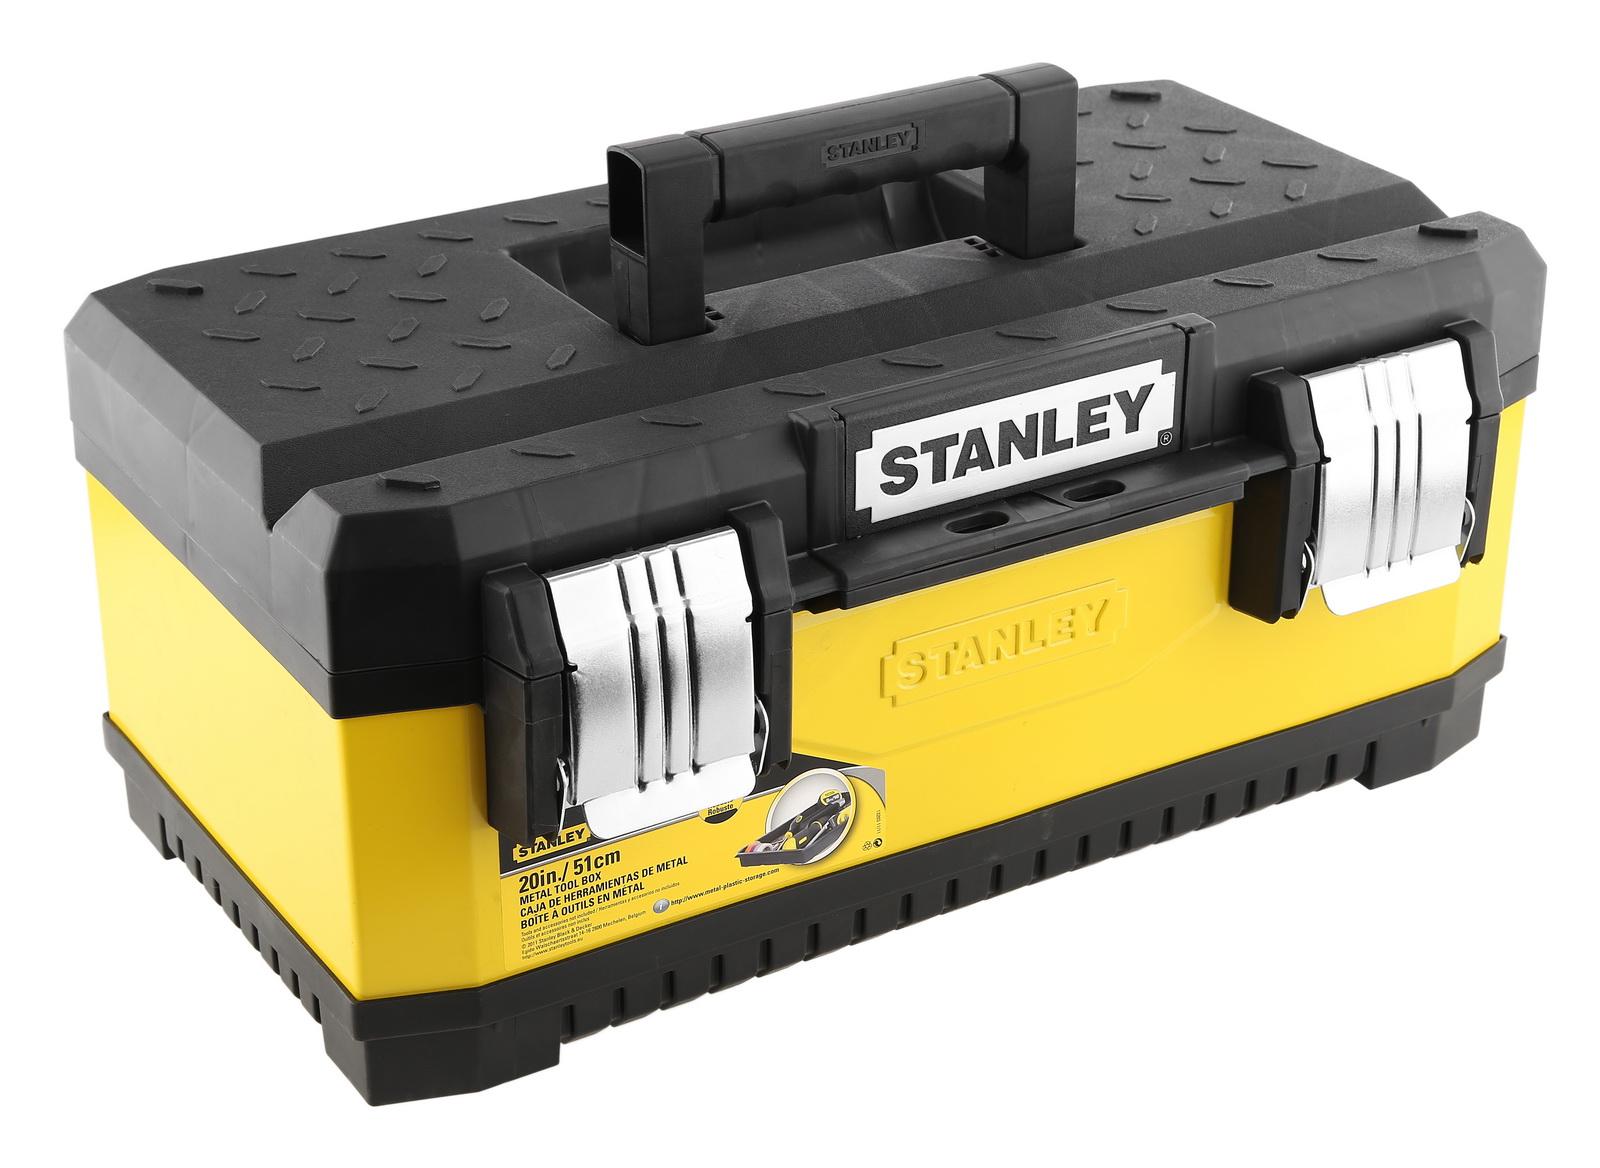 Stanley (1-95-612) - ящик для инструментов 20''  набор из 20 инструментов stanley zipper wallet 1 90 597